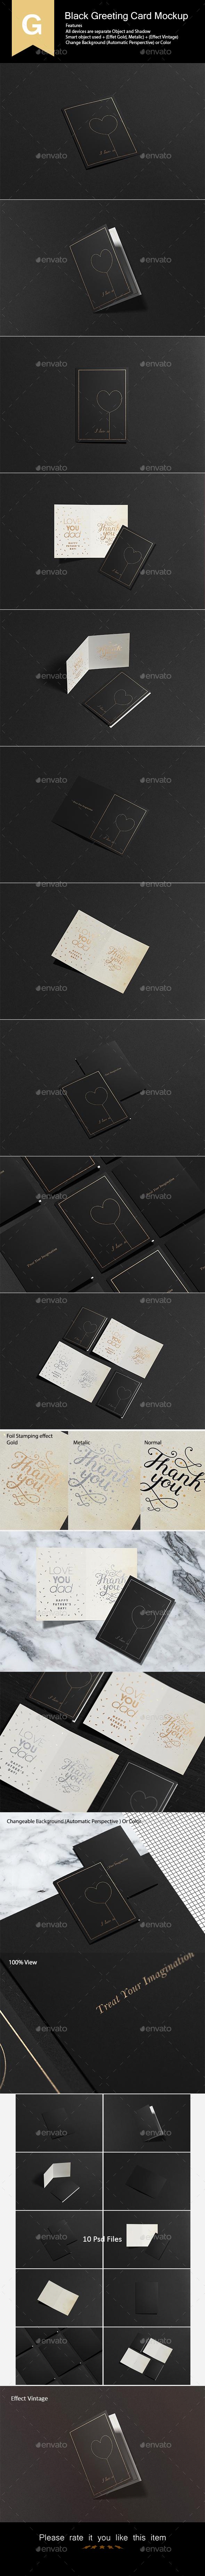 Black Greeting Card Mock-Up